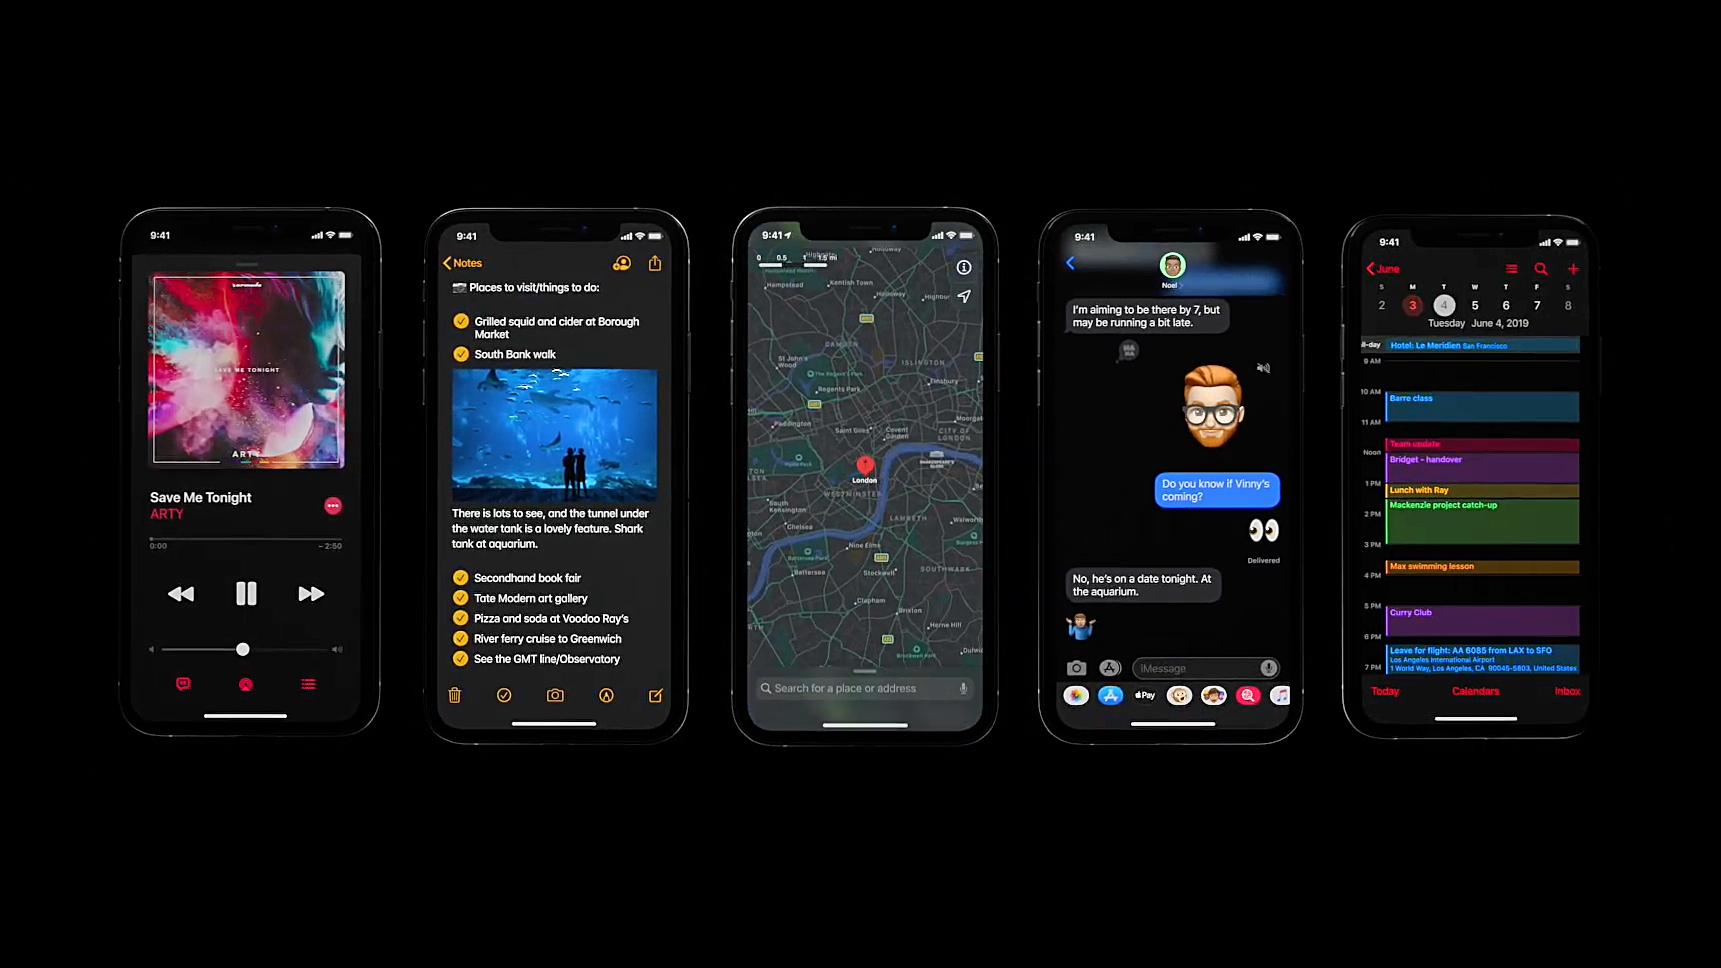 Apple iOS 13: twice as fast, dark mode, and improved Memoji